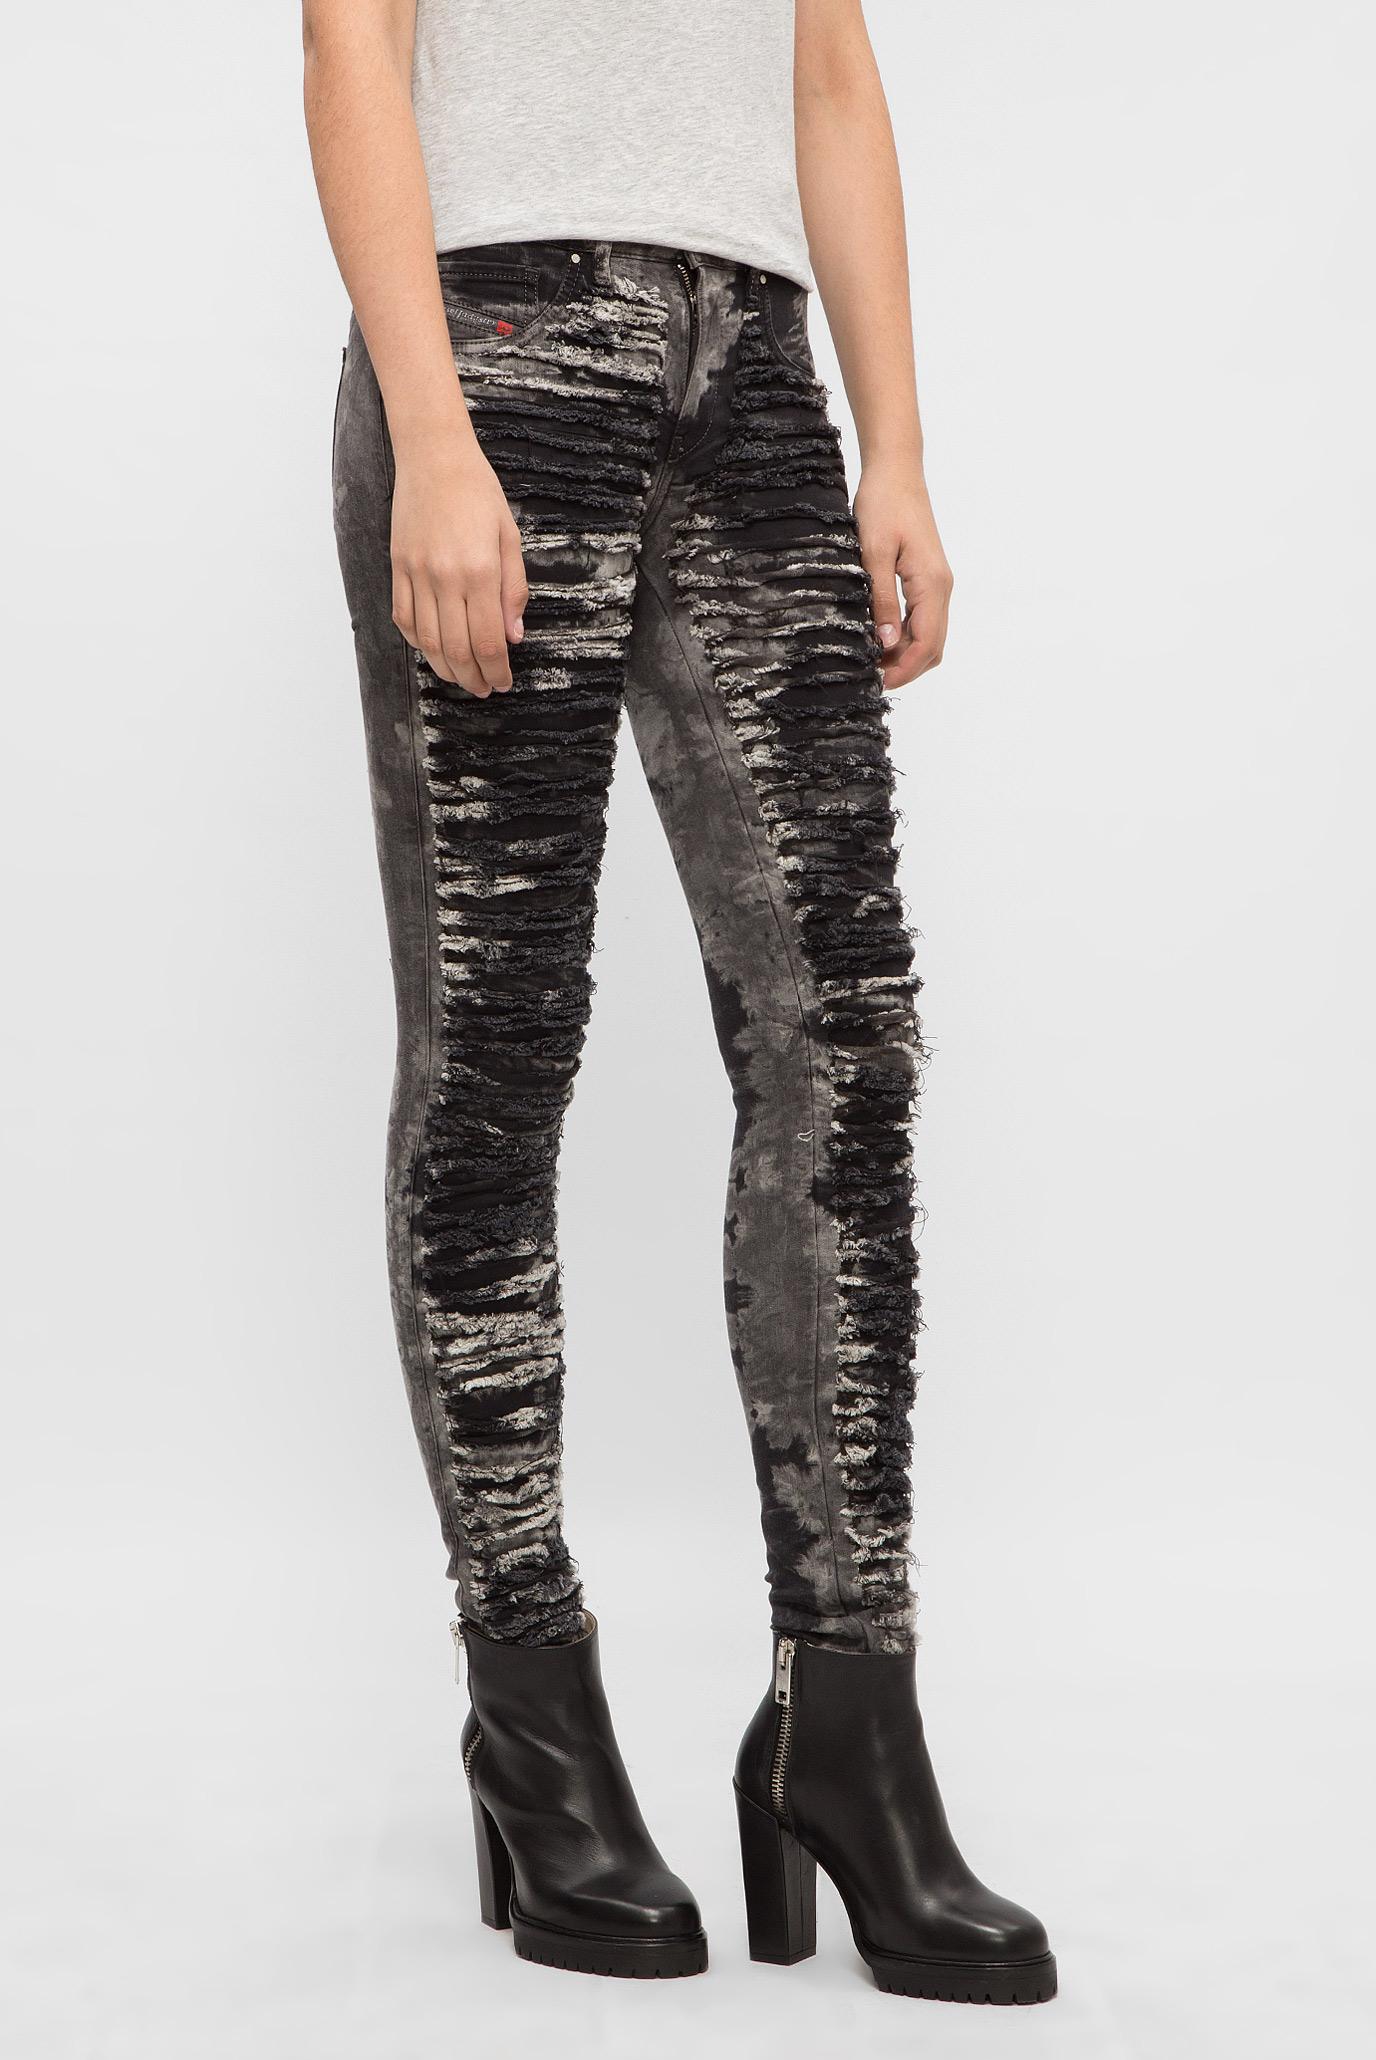 Купить Женские серые джинсы DHARY  Diesel Diesel 00S594 0686N – Киев, Украина. Цены в интернет магазине MD Fashion